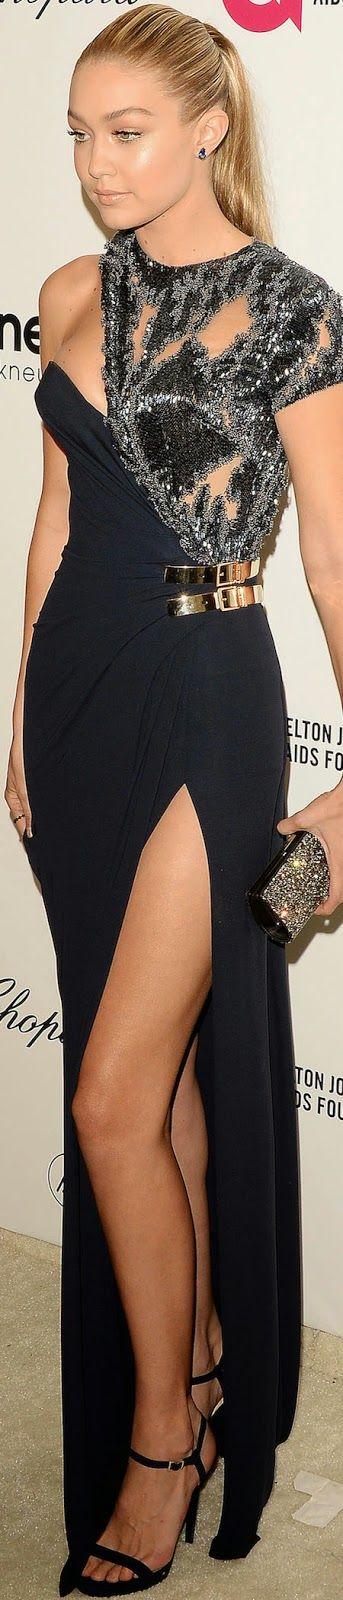 Gigi Hadid 2015 Elton John Oscar Party / Gigi Hadid in Versace